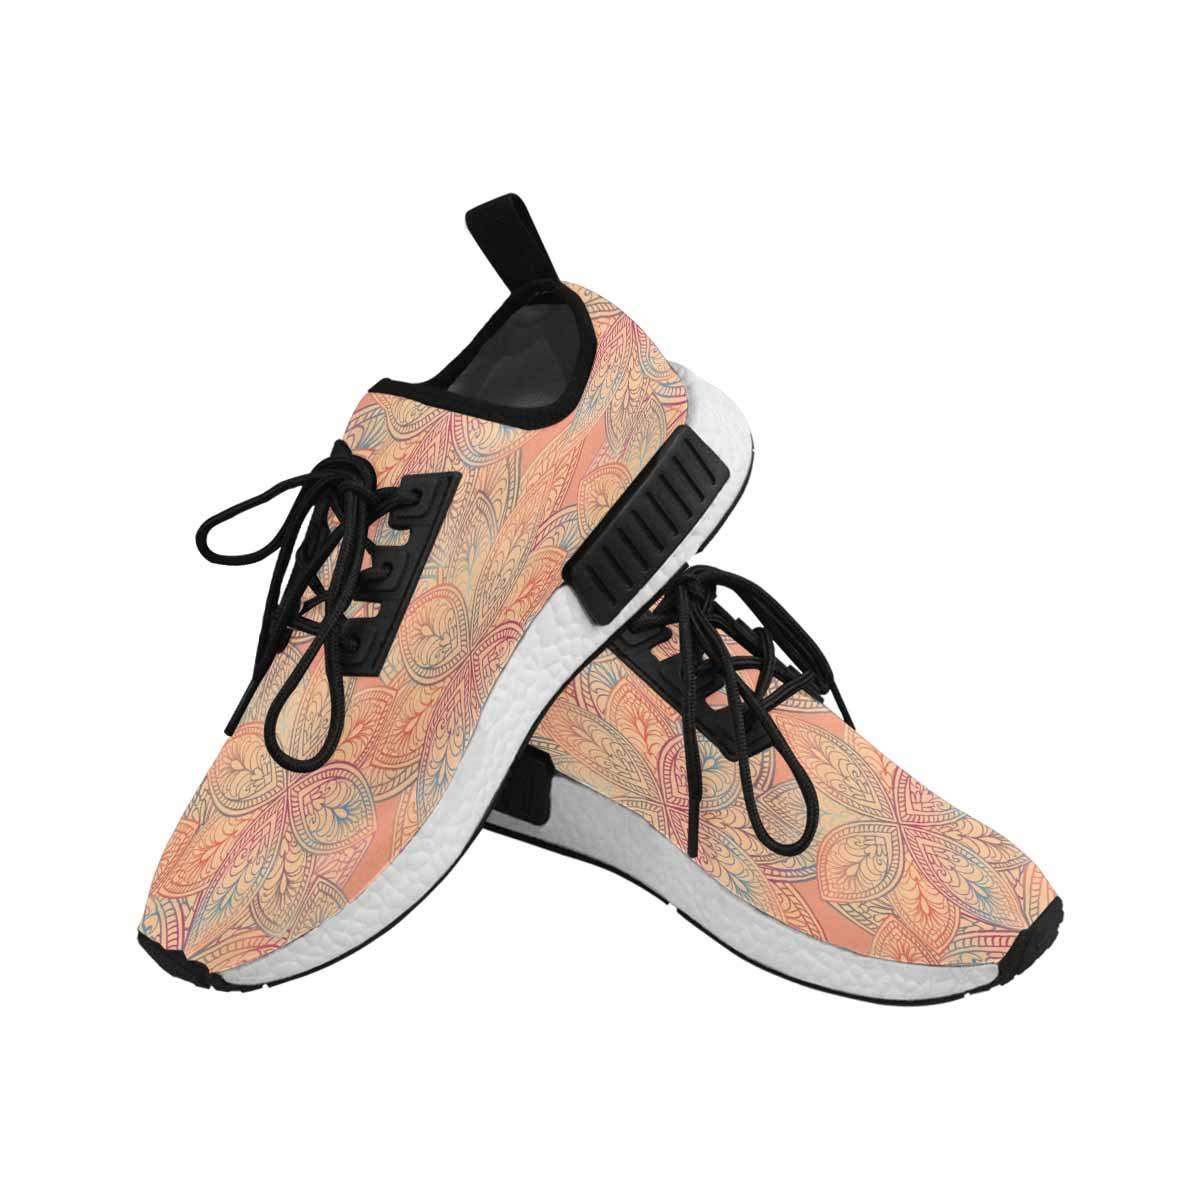 InterestPrint Women's Draco Running Comfort Sports Athletic Shoes Flowers 6 B(M) US